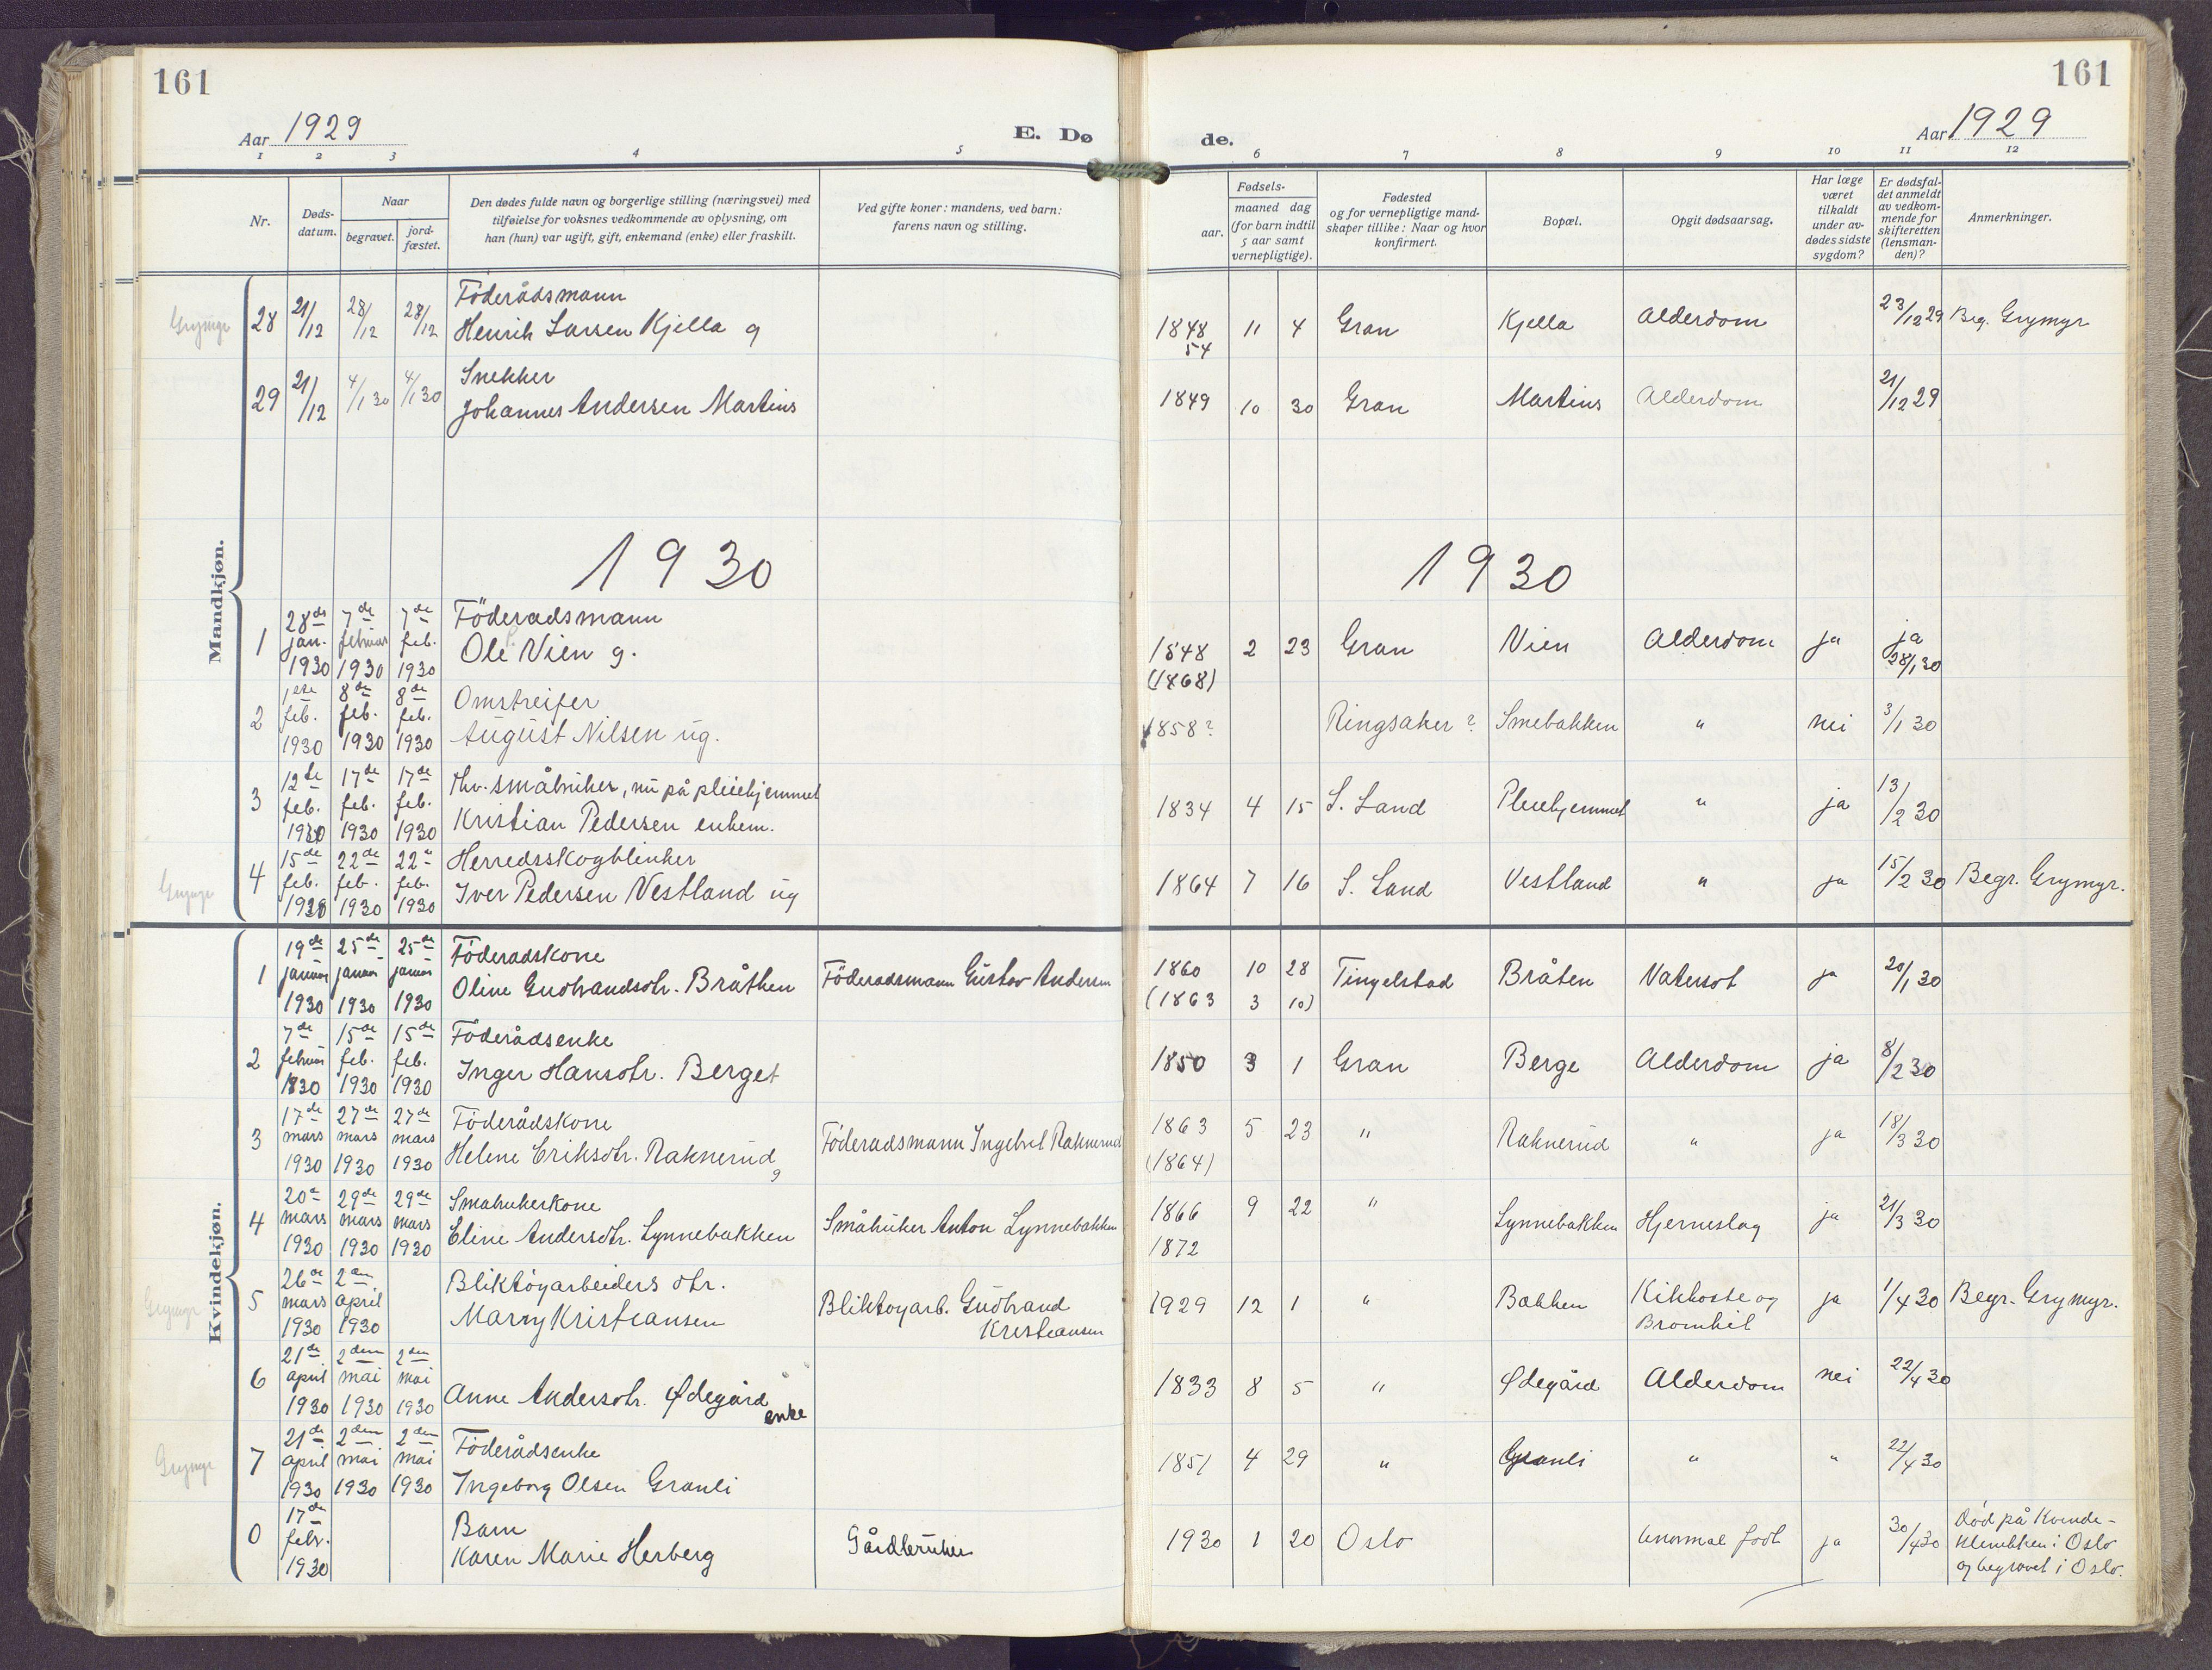 SAH, Gran prestekontor, Ministerialbok nr. 23, 1919-1938, s. 161